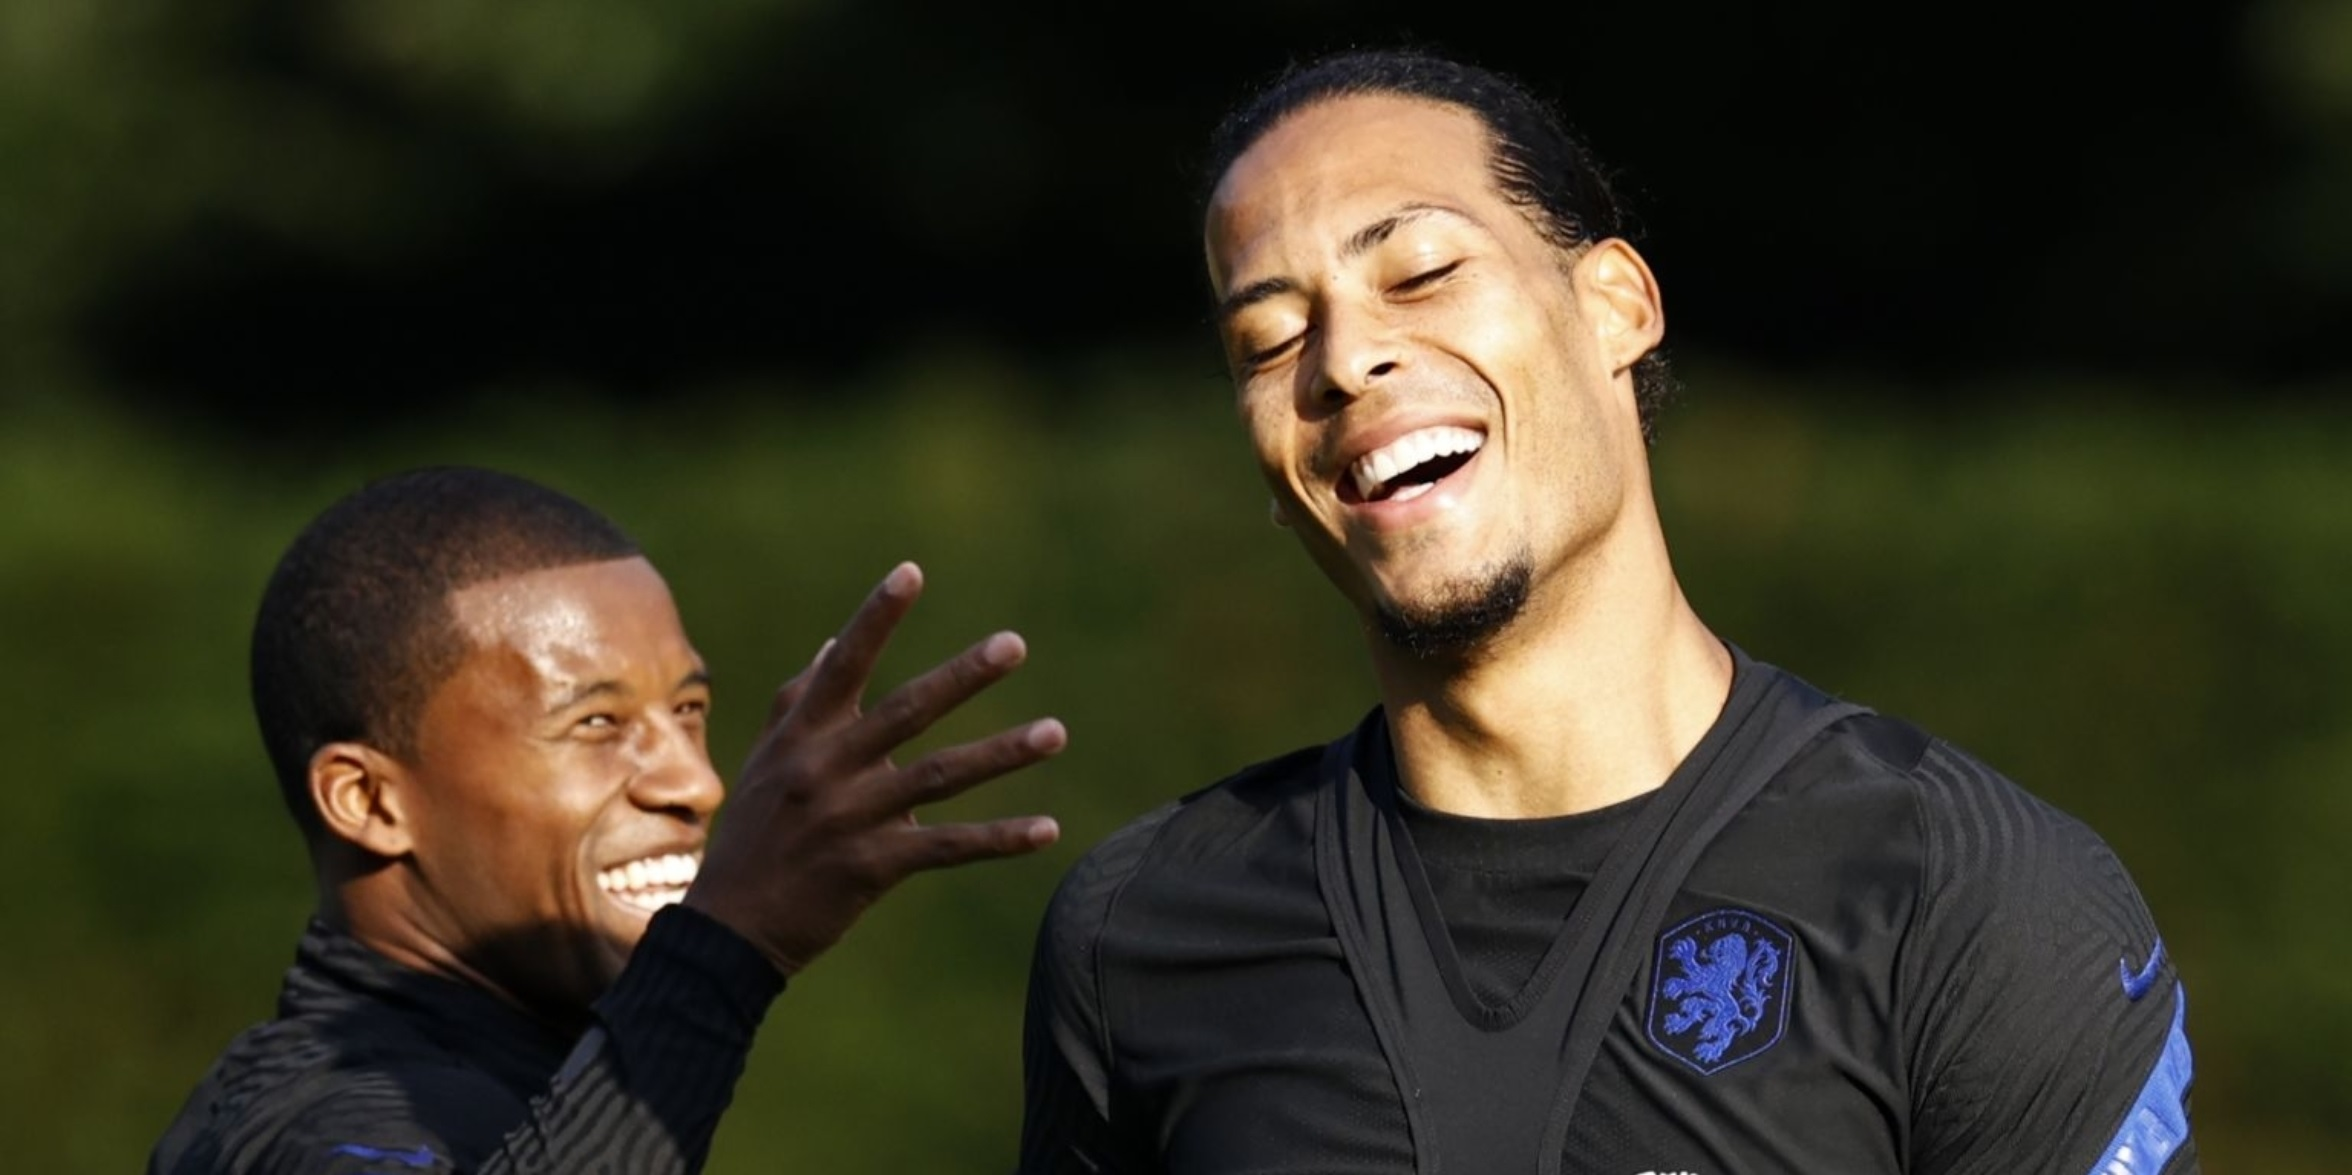 (Photos) Wijnaldum snapped training with Liverpool star during international break